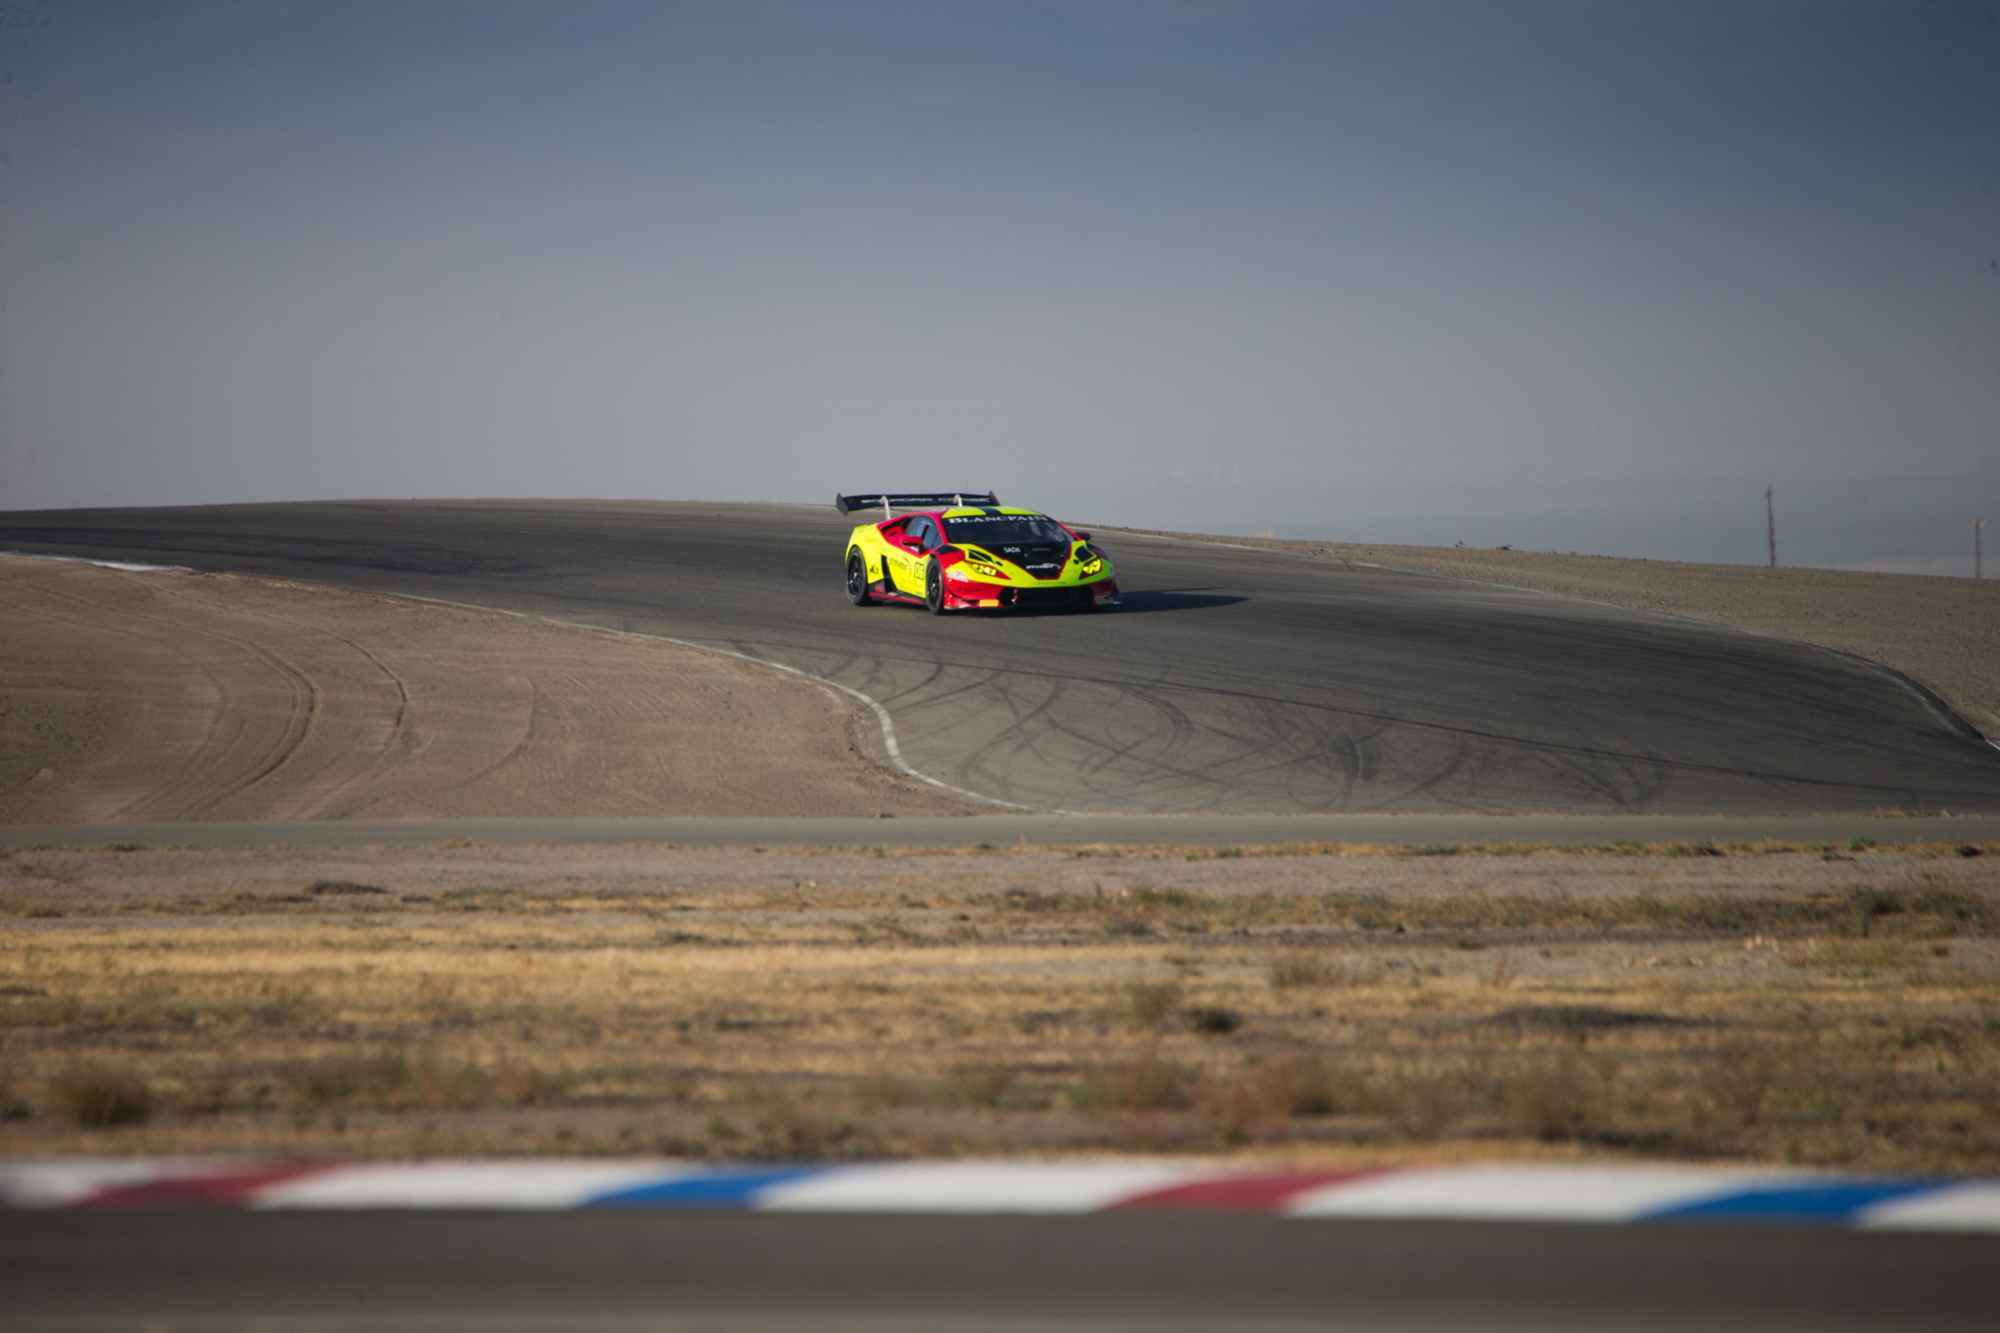 Steven-Racing-20171027-53486.jpg